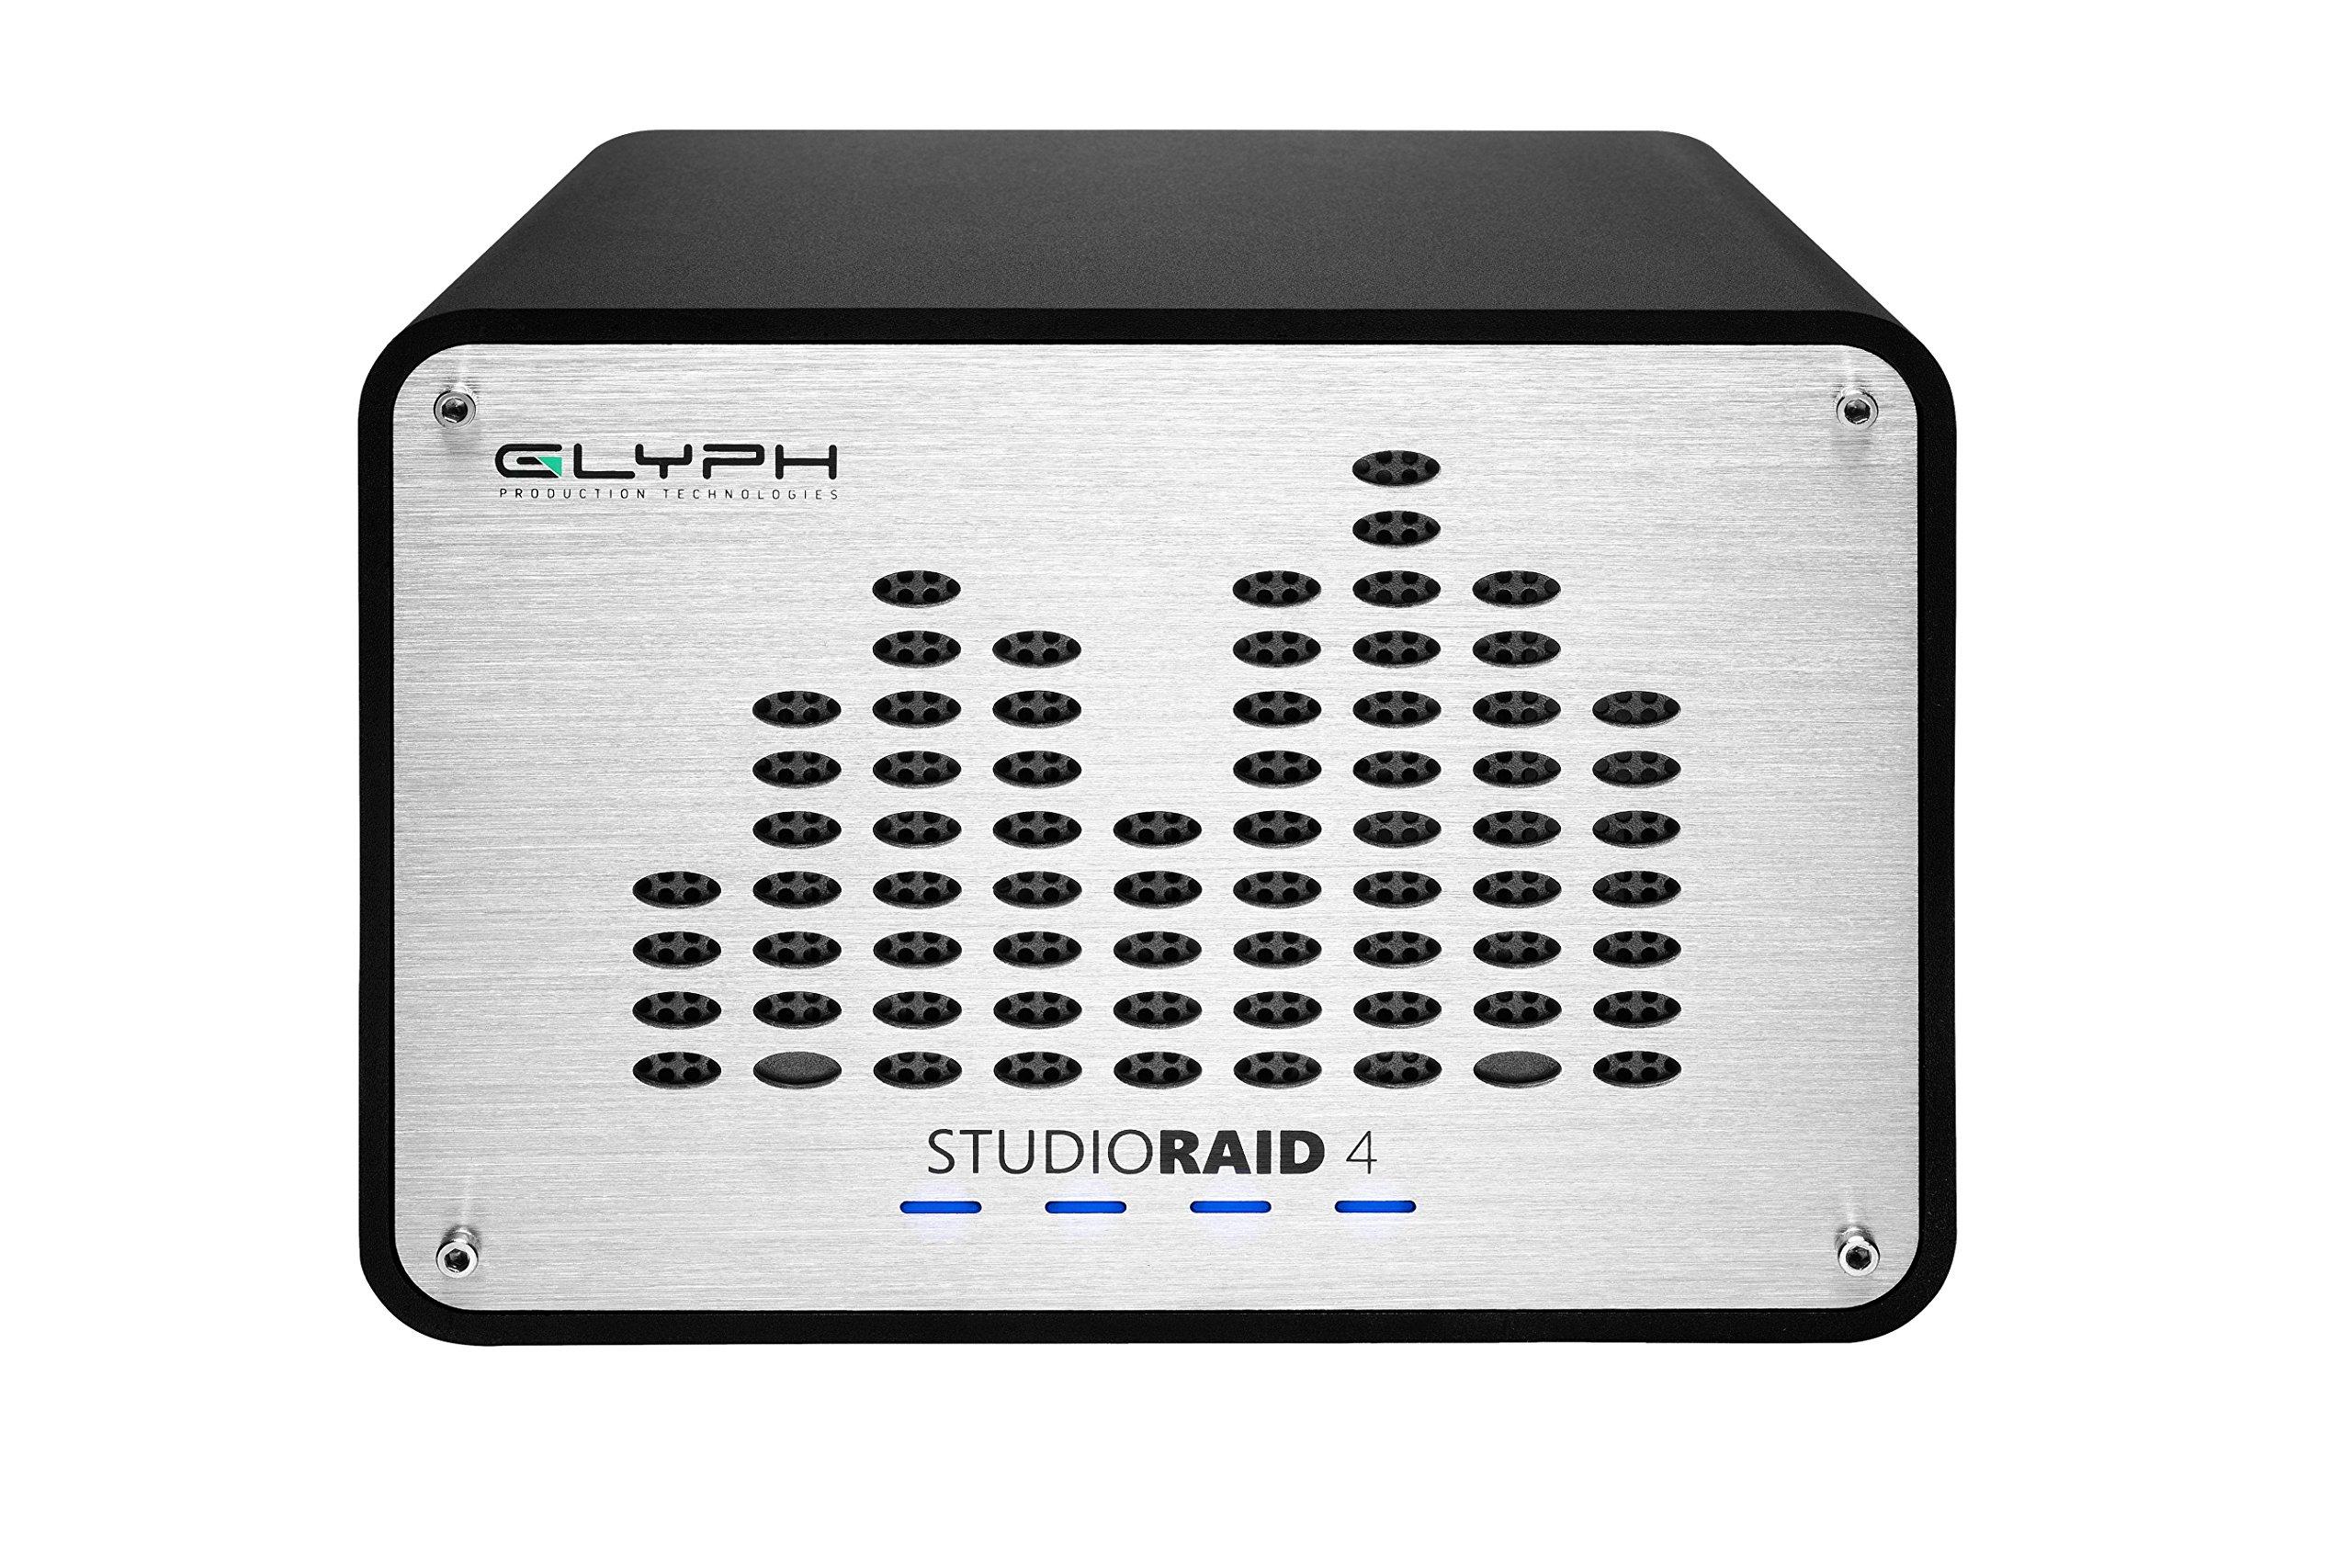 Glyph Studio RAID 4 SRF32000 32TB External Hard Drive RAID 0, 1 or JBOD (7200RPM, USB 3, FW800, eSATA)